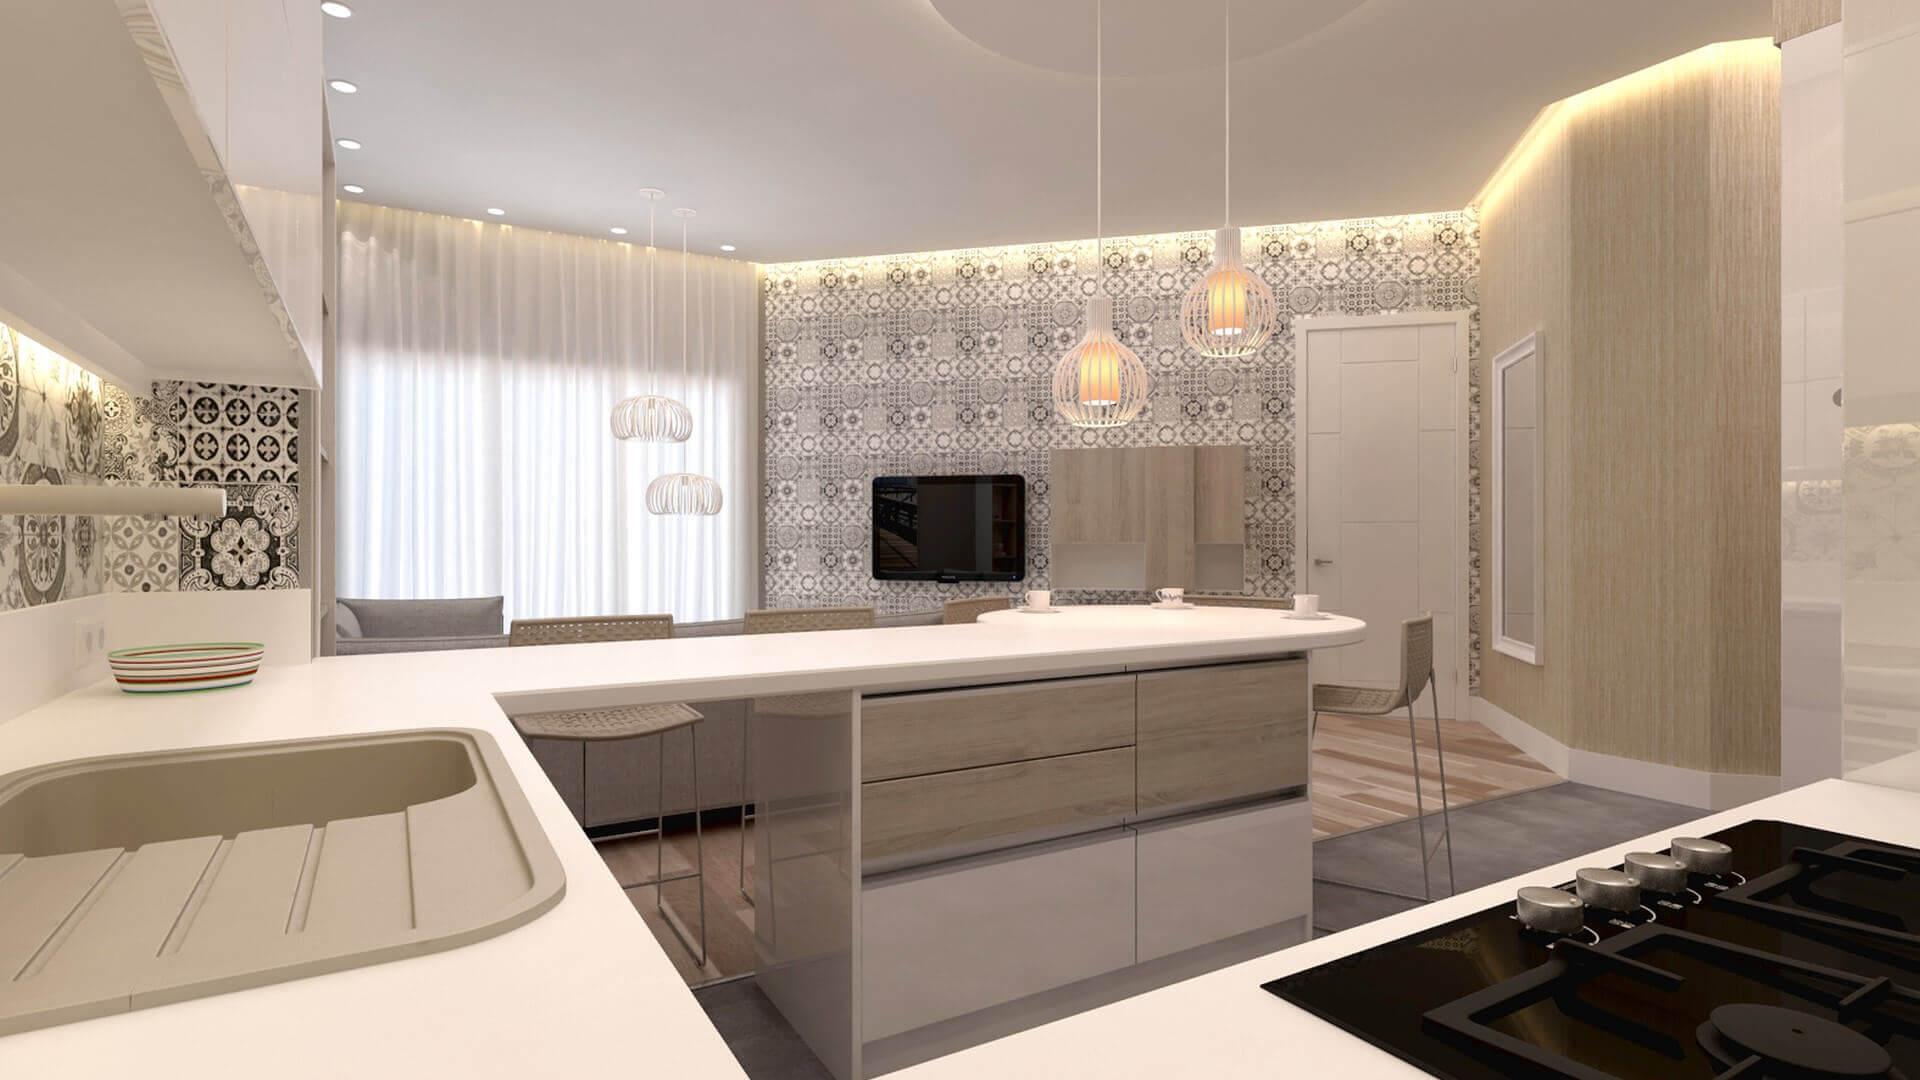 3194 D. Aslan Flat Residential